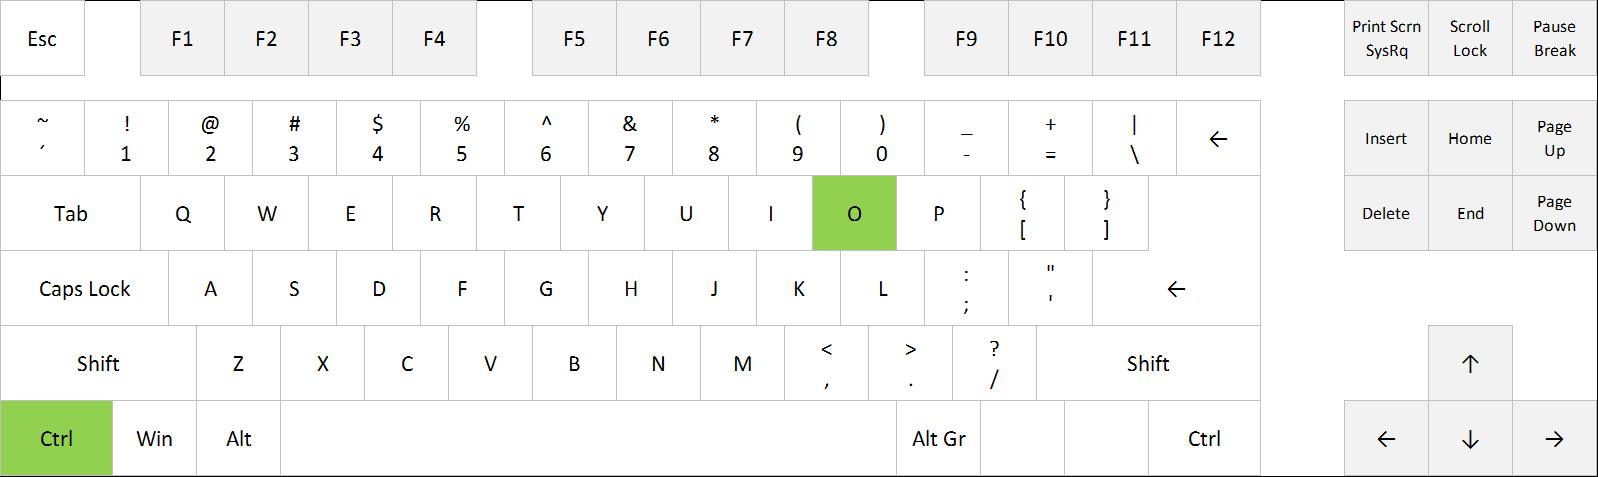 Open workbook in Excel: Ctrl+O